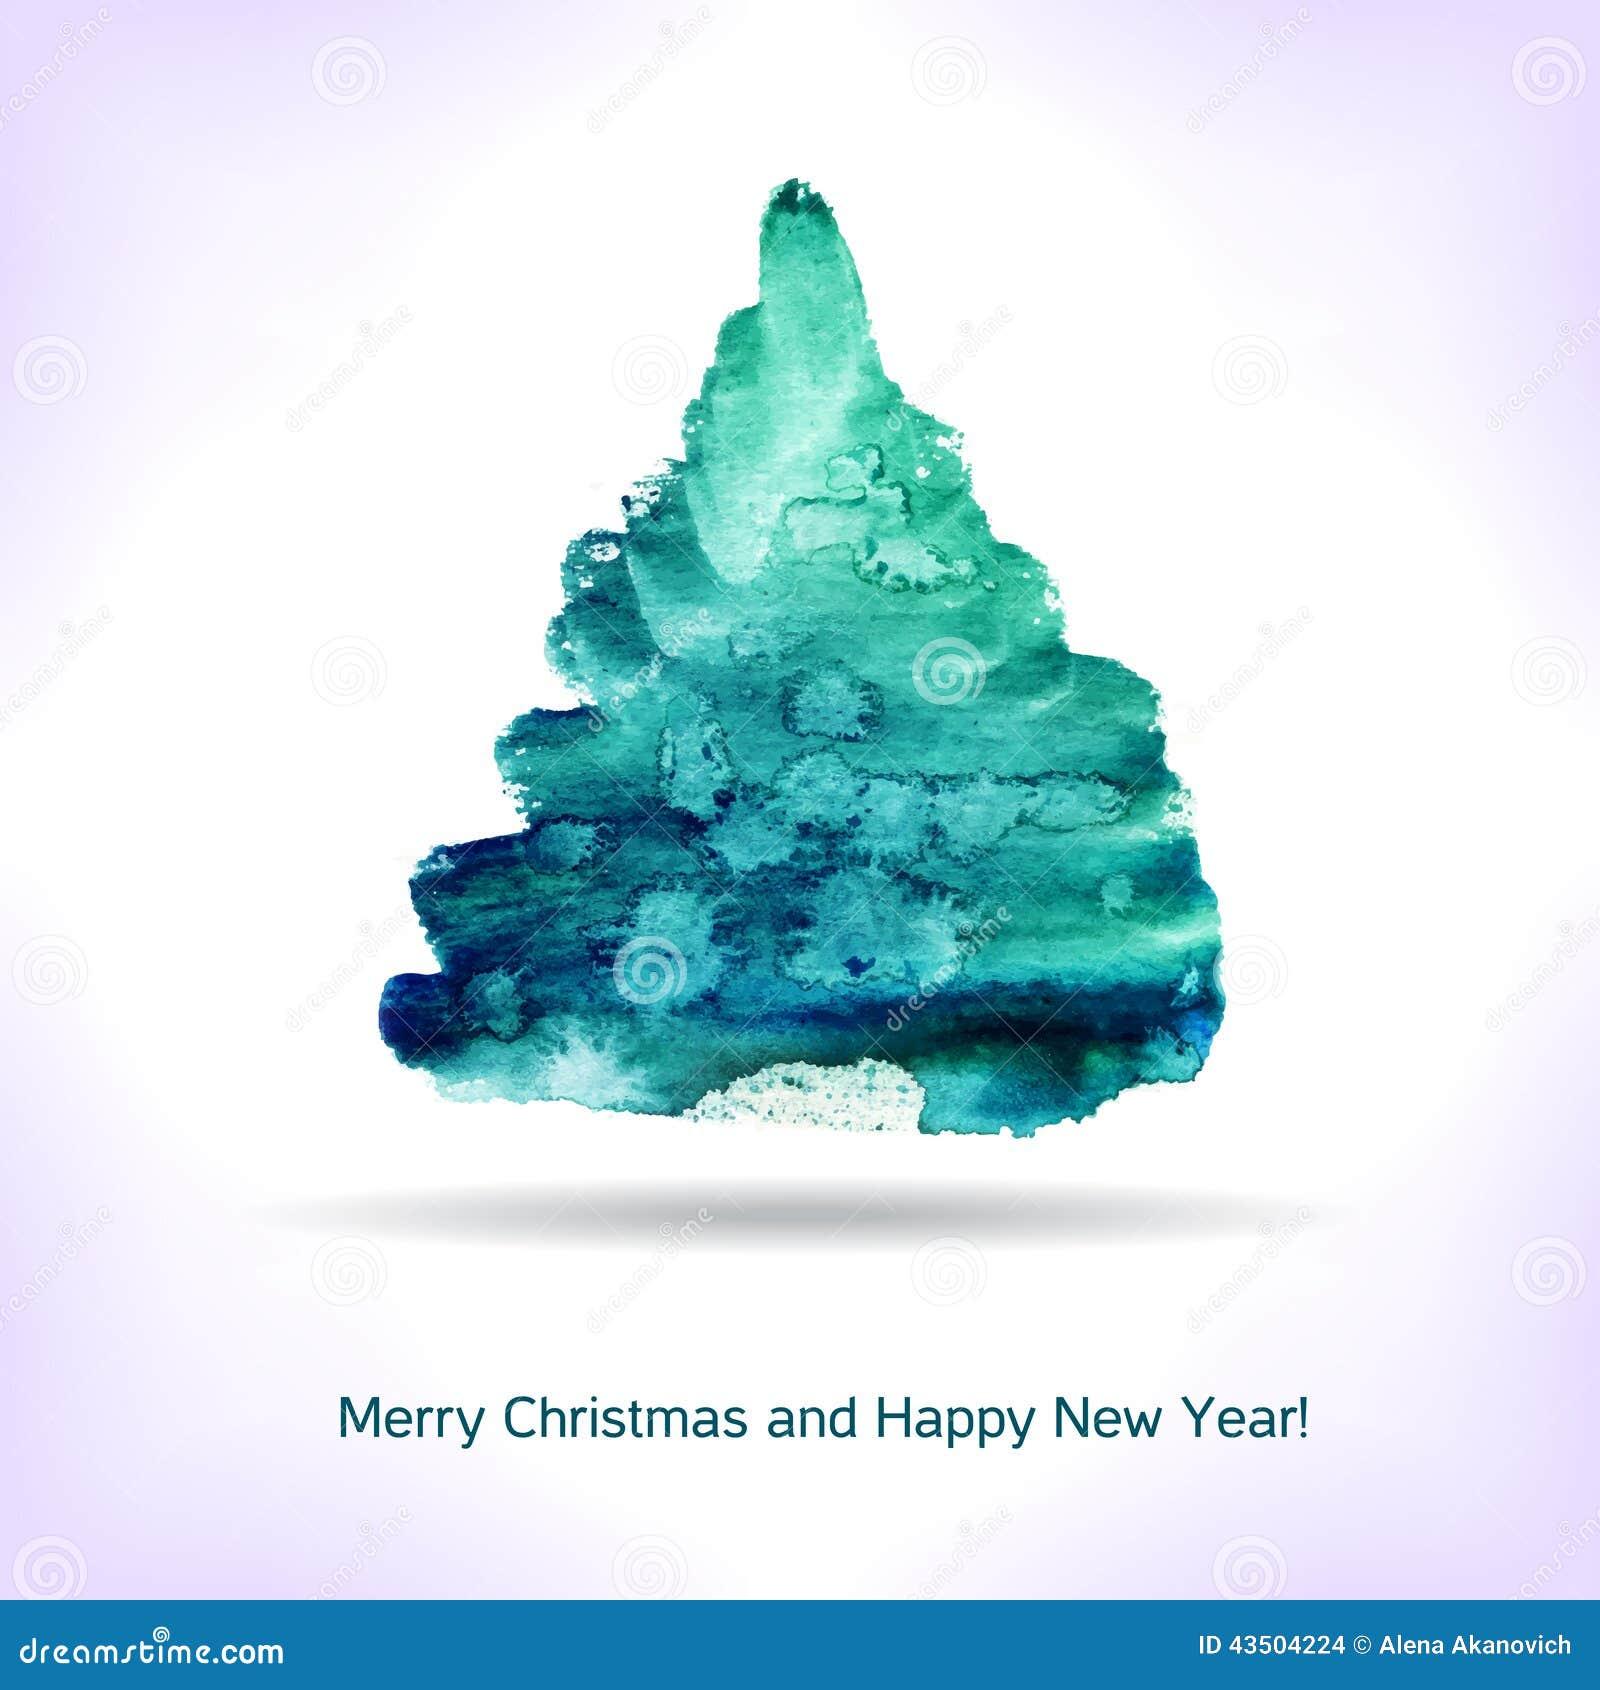 Shell Credit Card >> Watercolor Christmas Card. Stock Vector - Image: 43504224